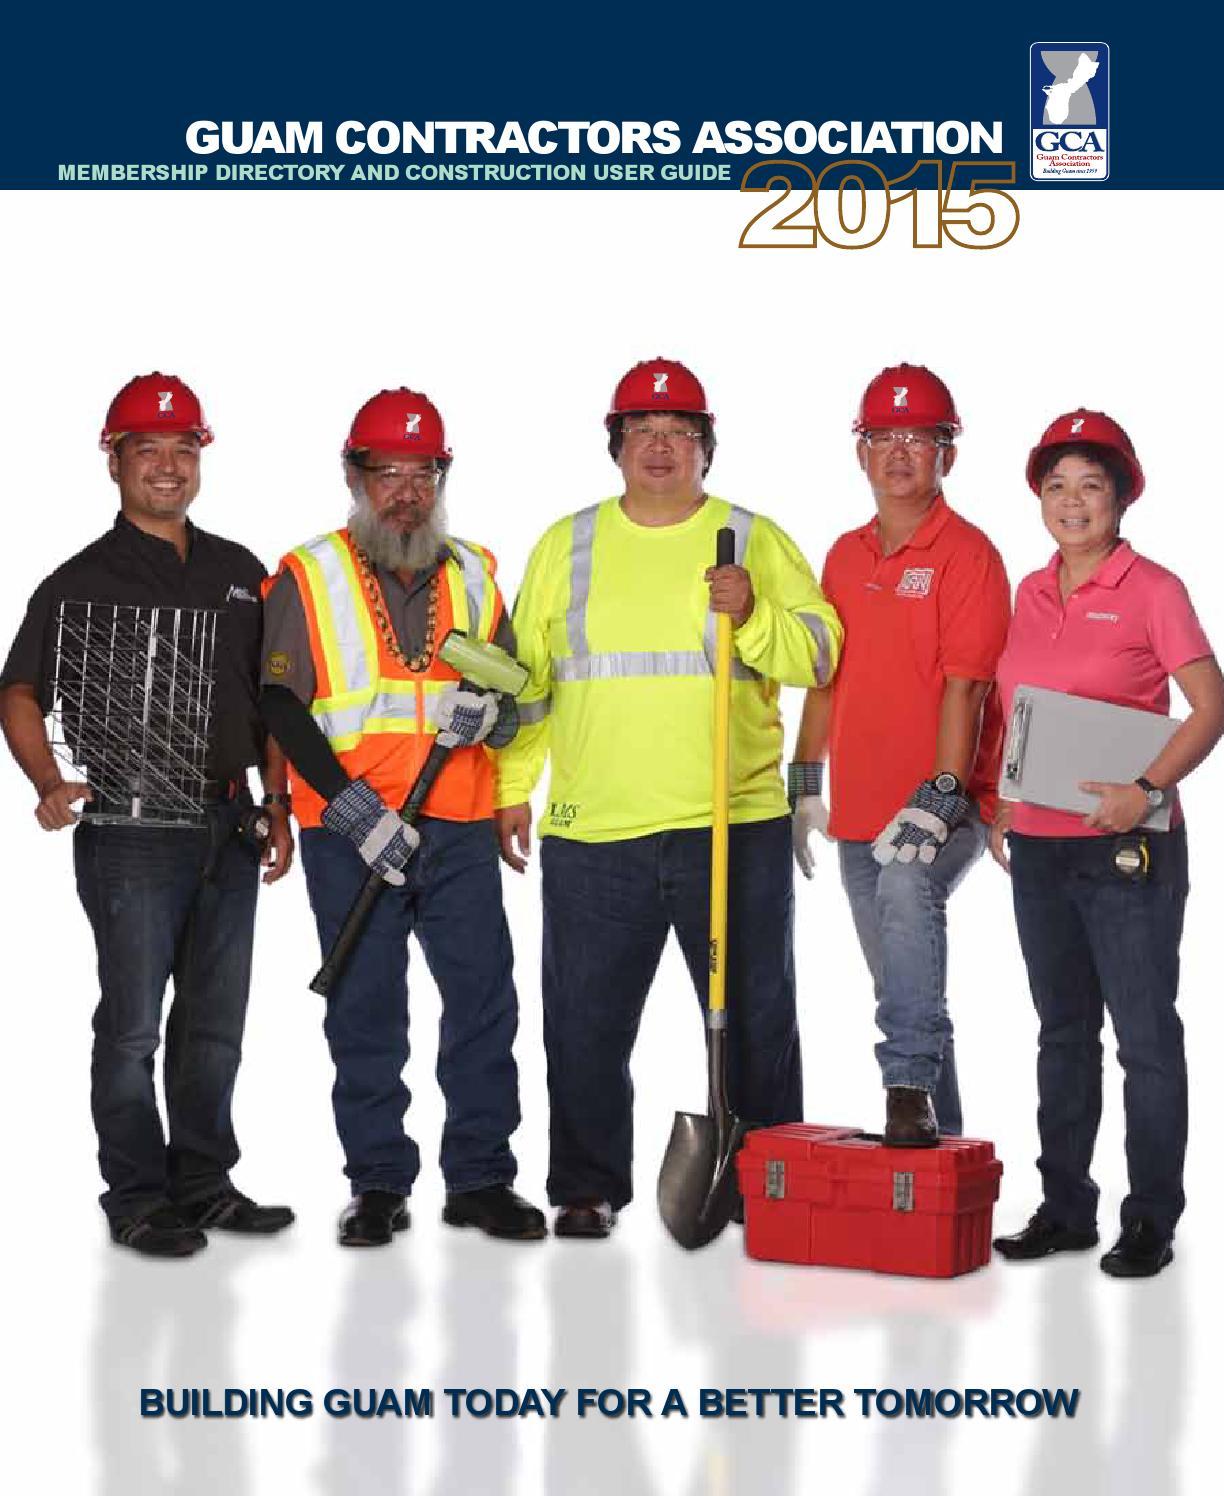 2015 GCA Membership Directory by Geri Leon Guerrero - issuu